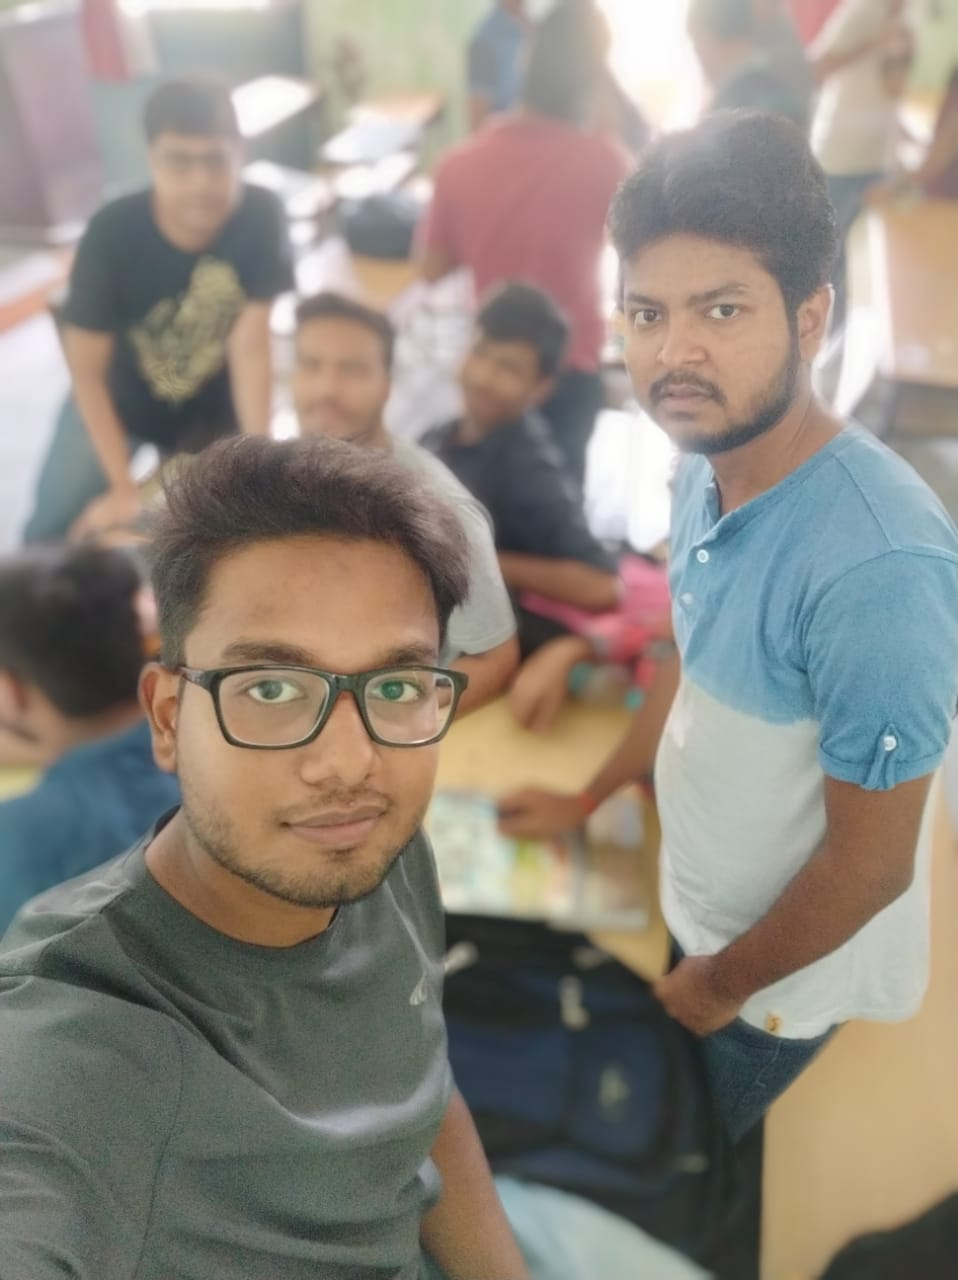 Redmi Note 5 Pro Front Camera Portrait Mode Test